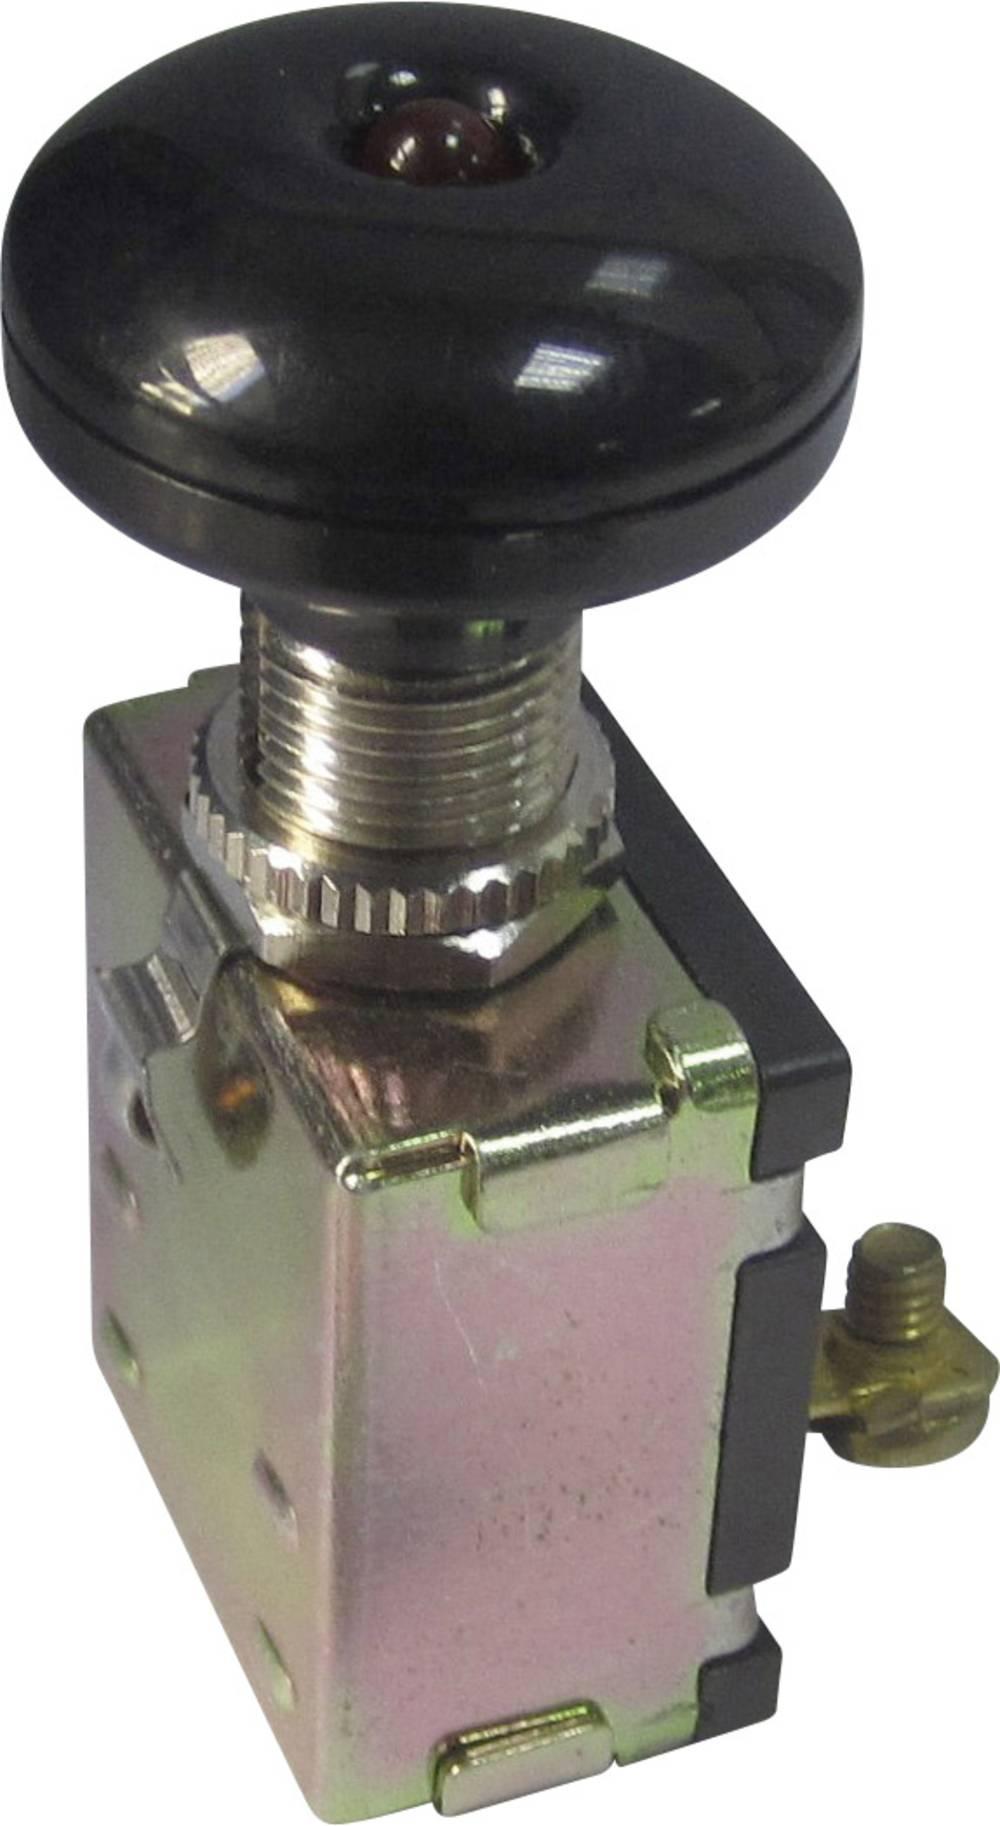 SCI Automobilski potezni prekidač12 V/DC 30 A A3-26L-SC M4 LED crveni isklop/uklop